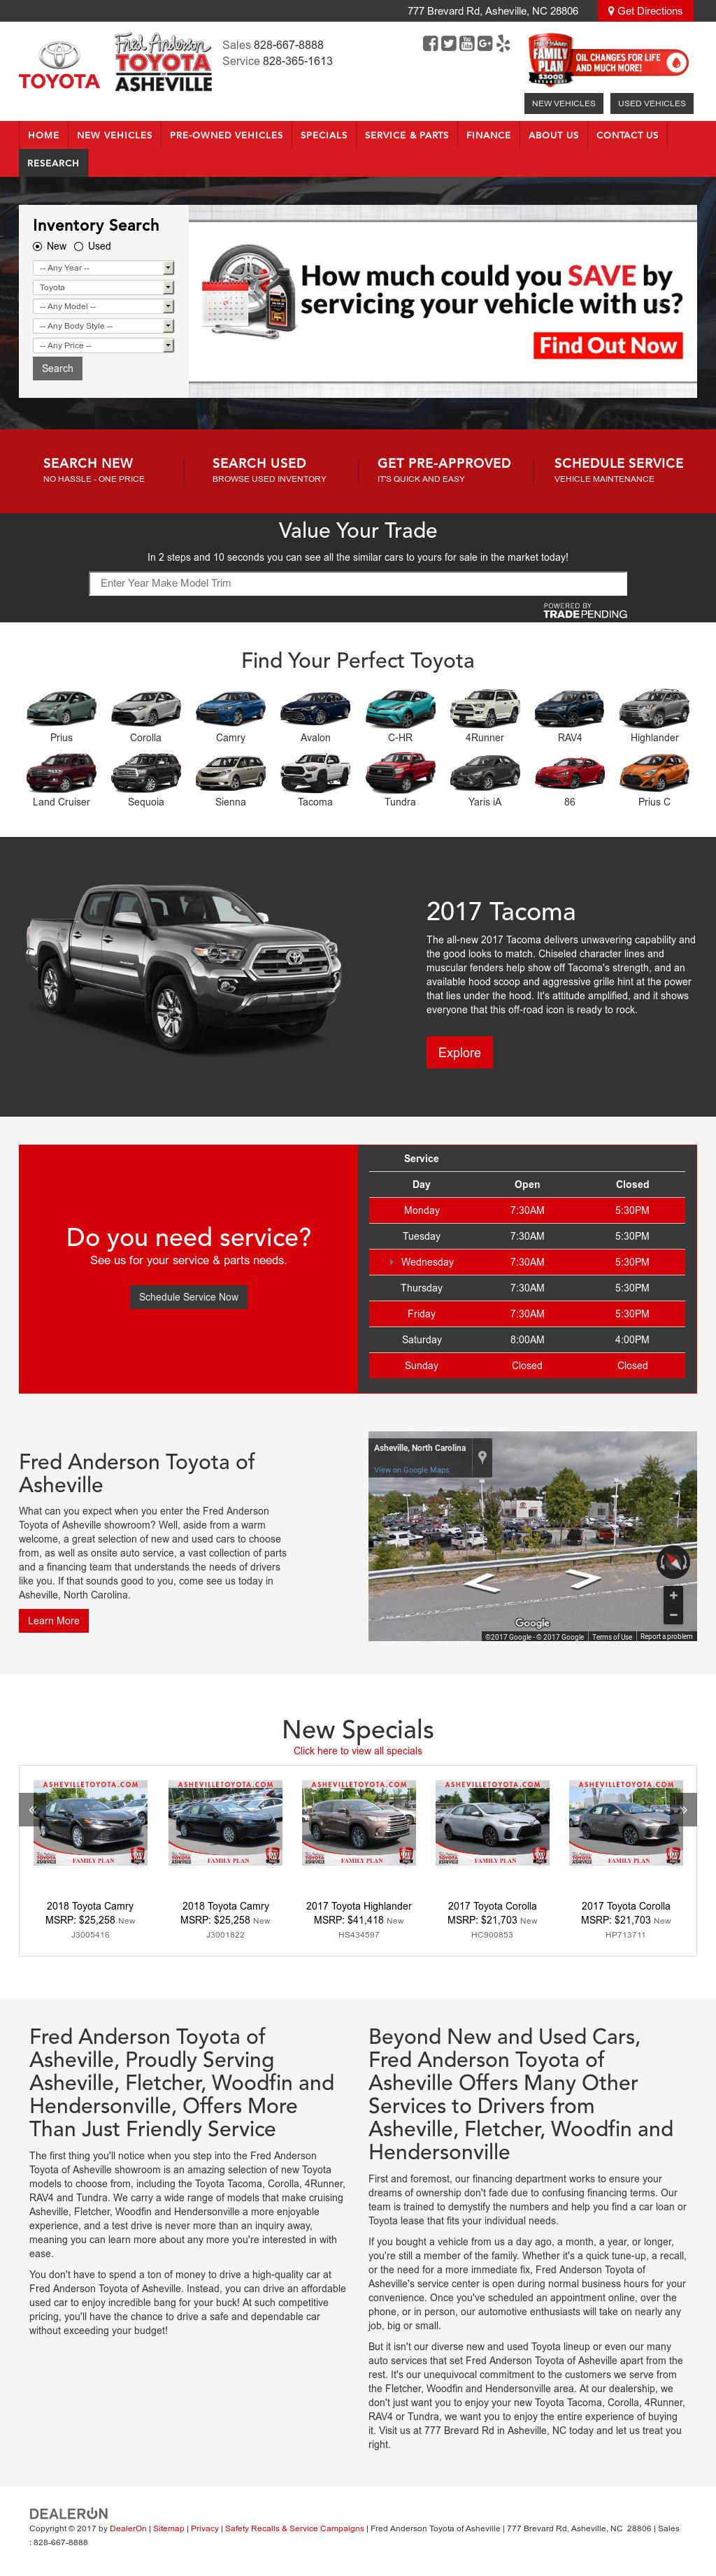 Jim Barkley Toyota Of Asheville Website History